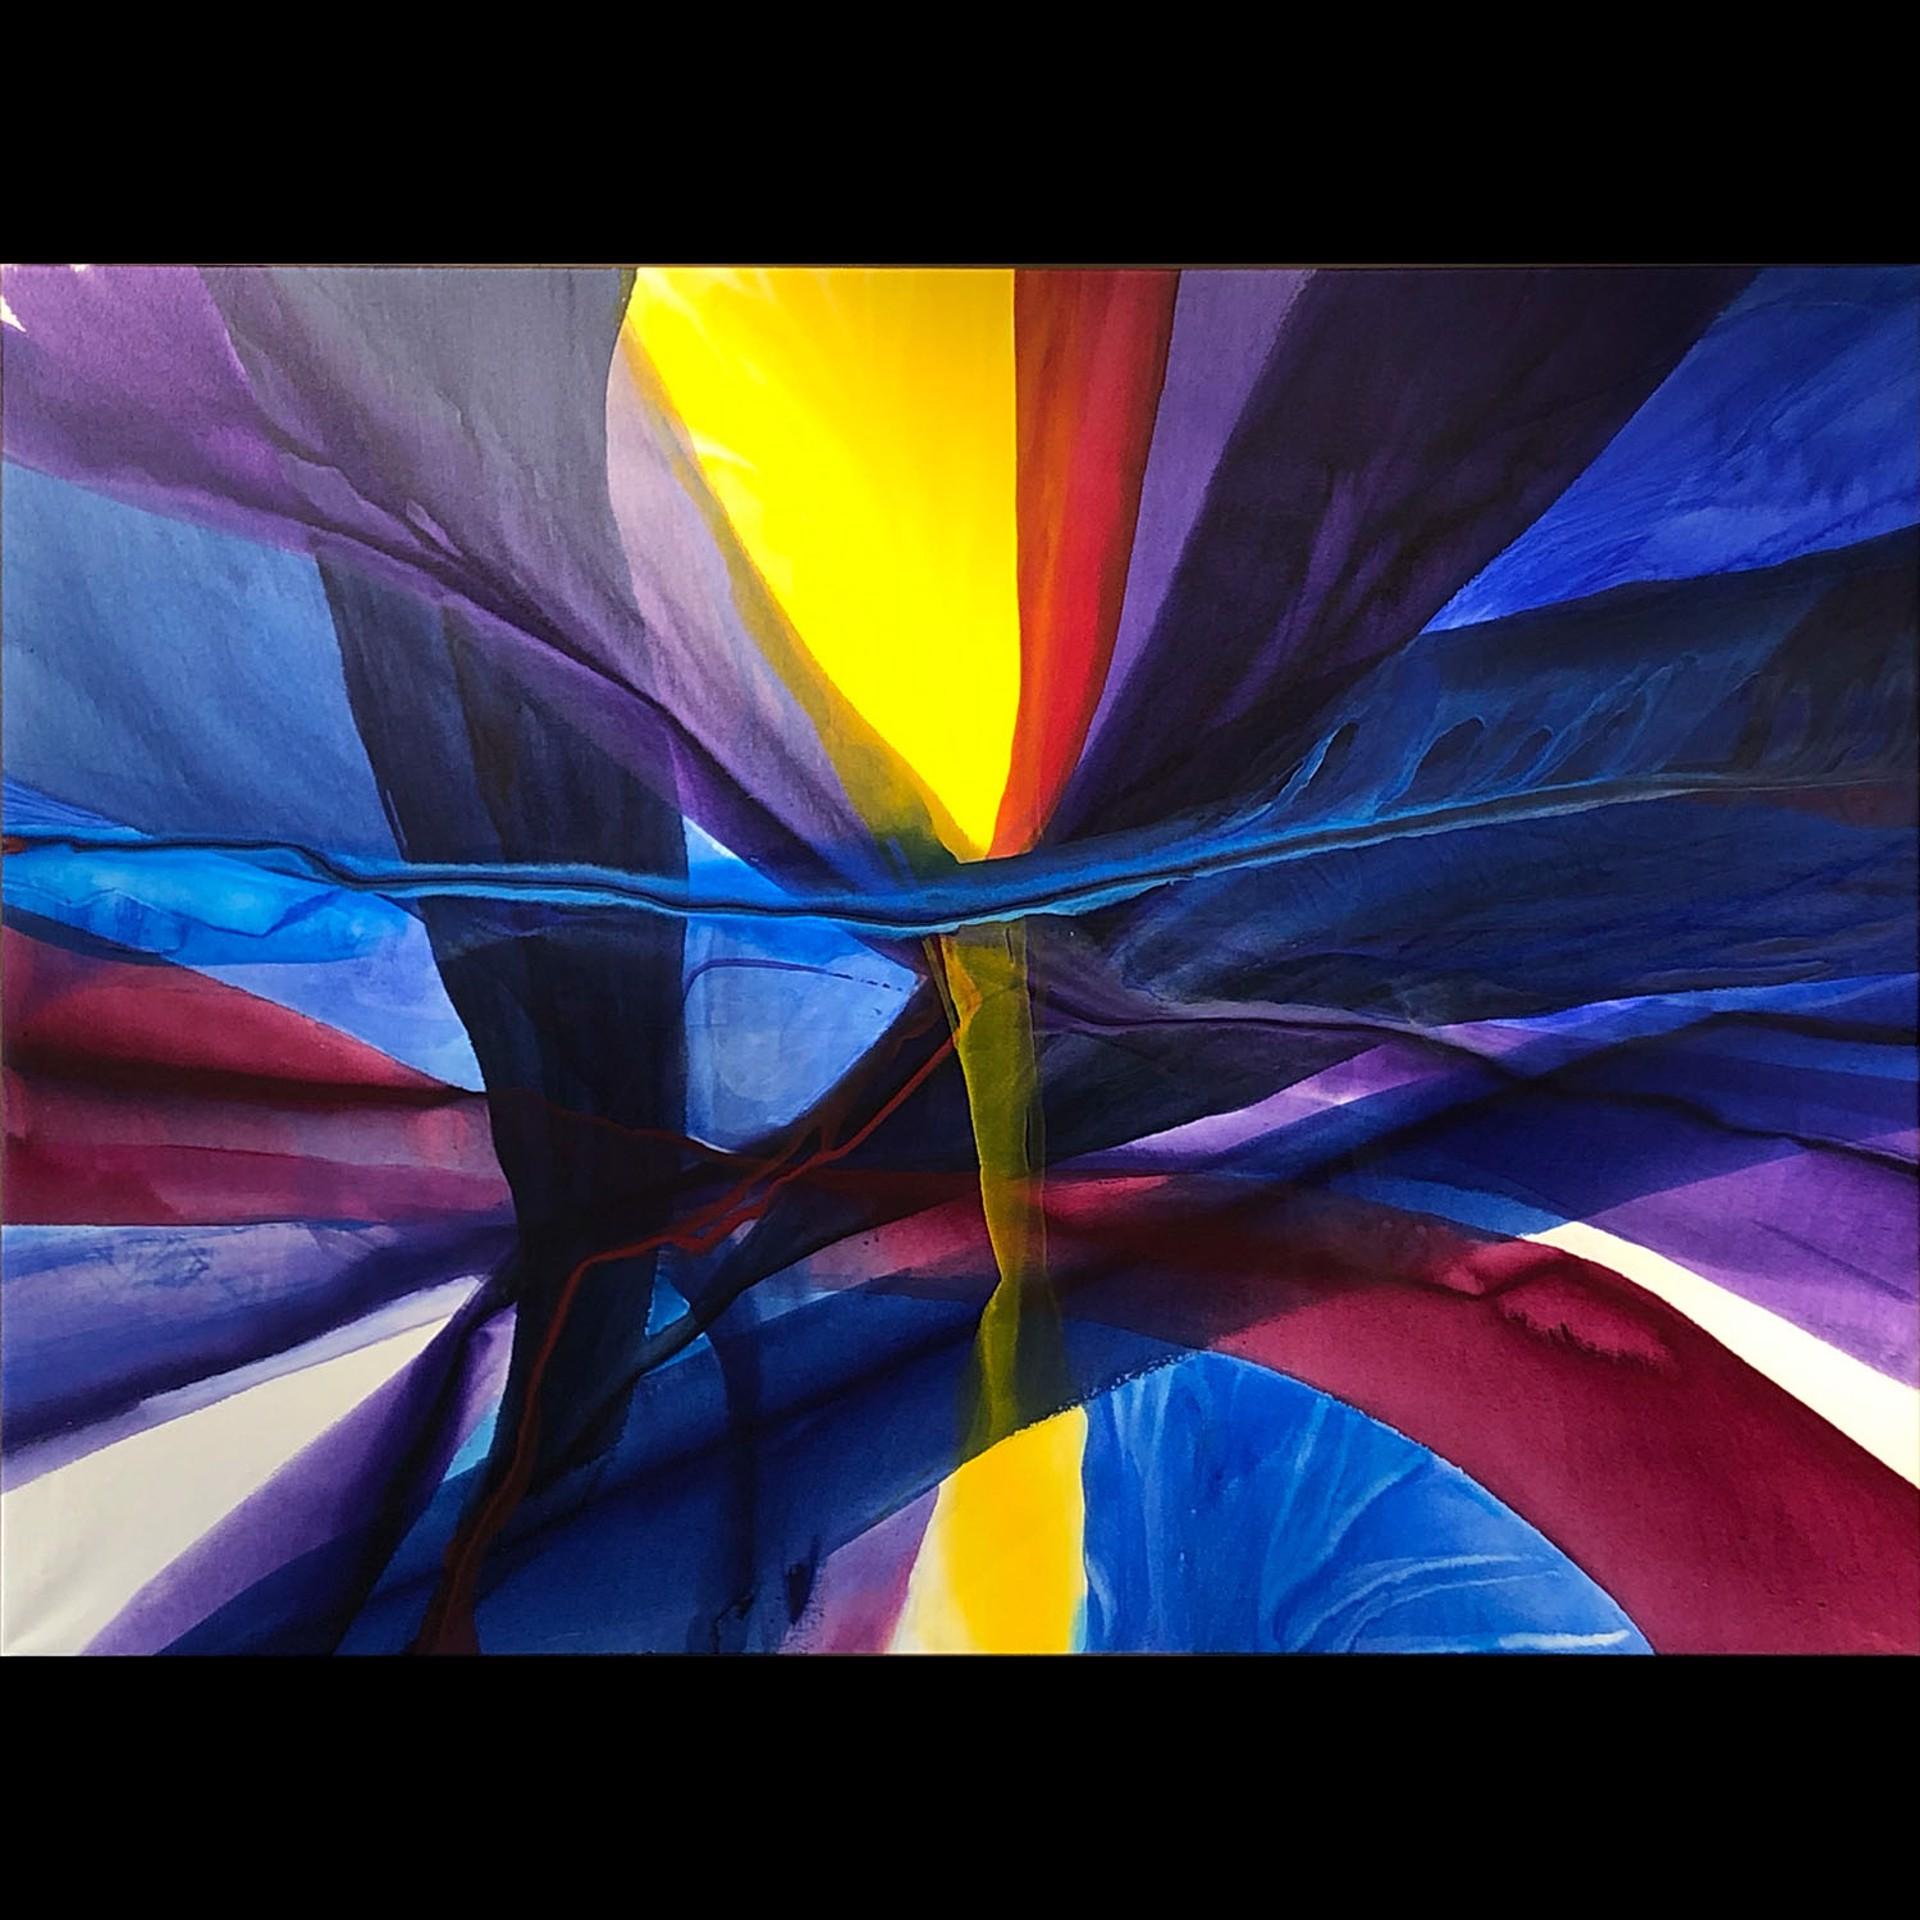 Symphony of Energy by Jill Amundsen